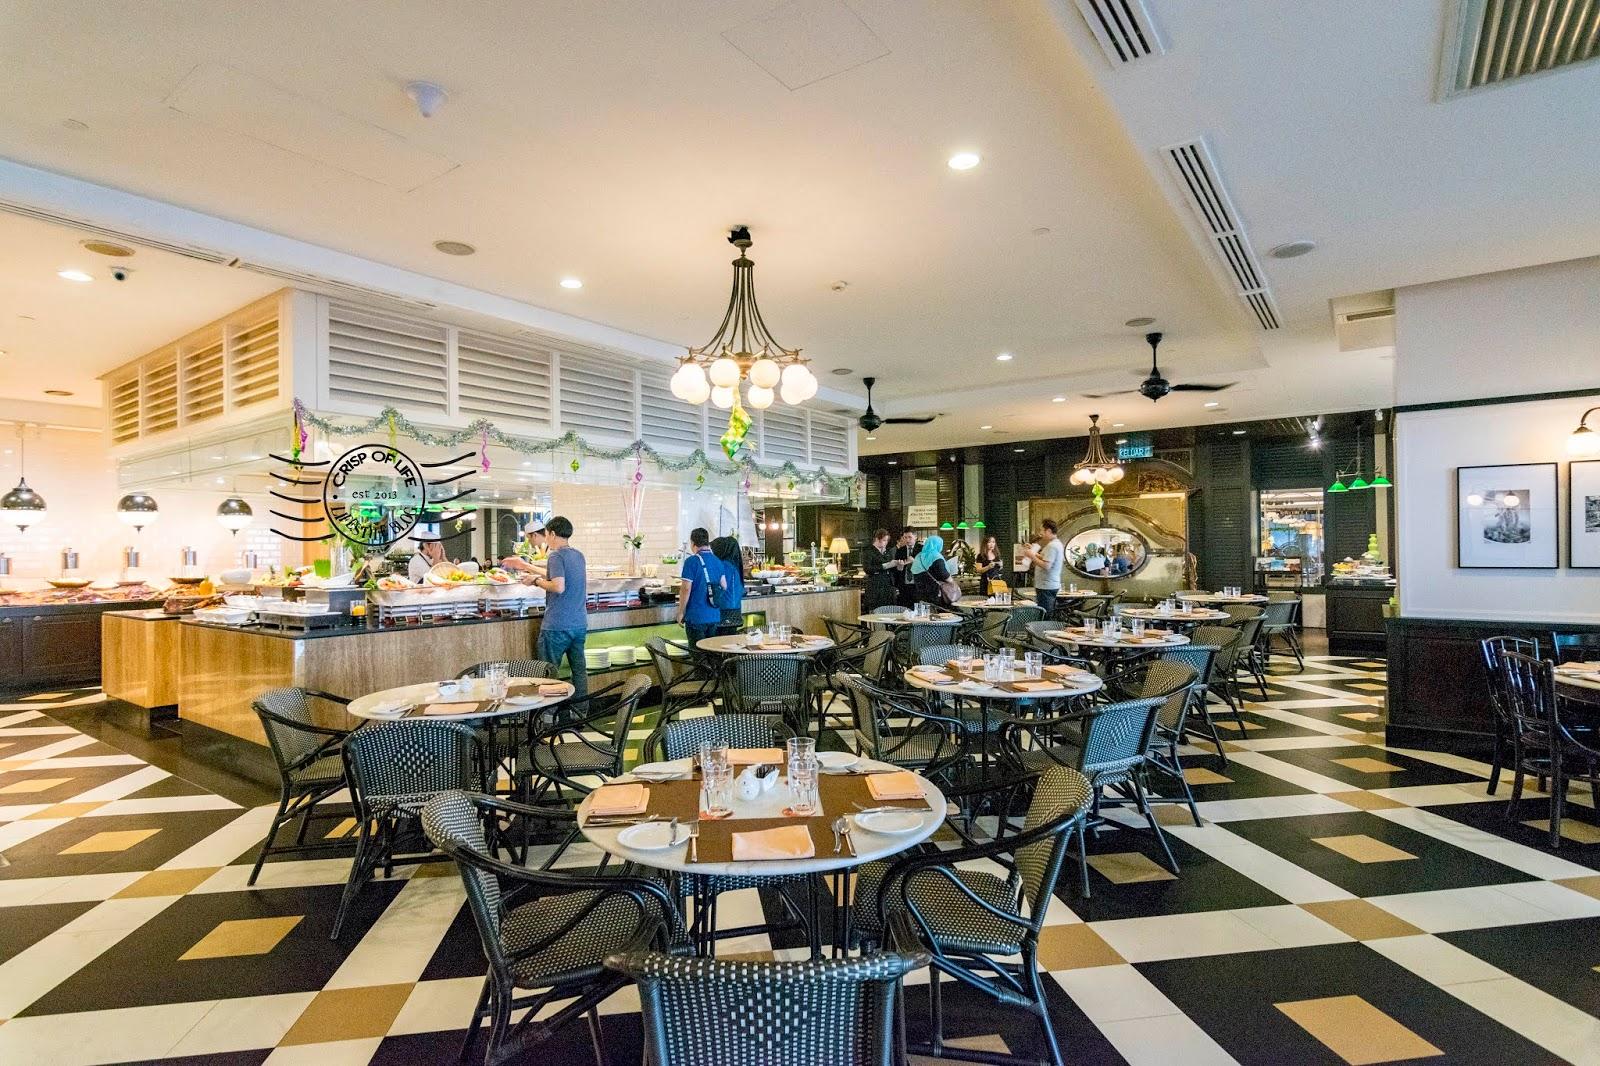 """Selera Kampung"" Ramadhan Buffet 2019 @ Eastern & Oriental Hotel, Penang"